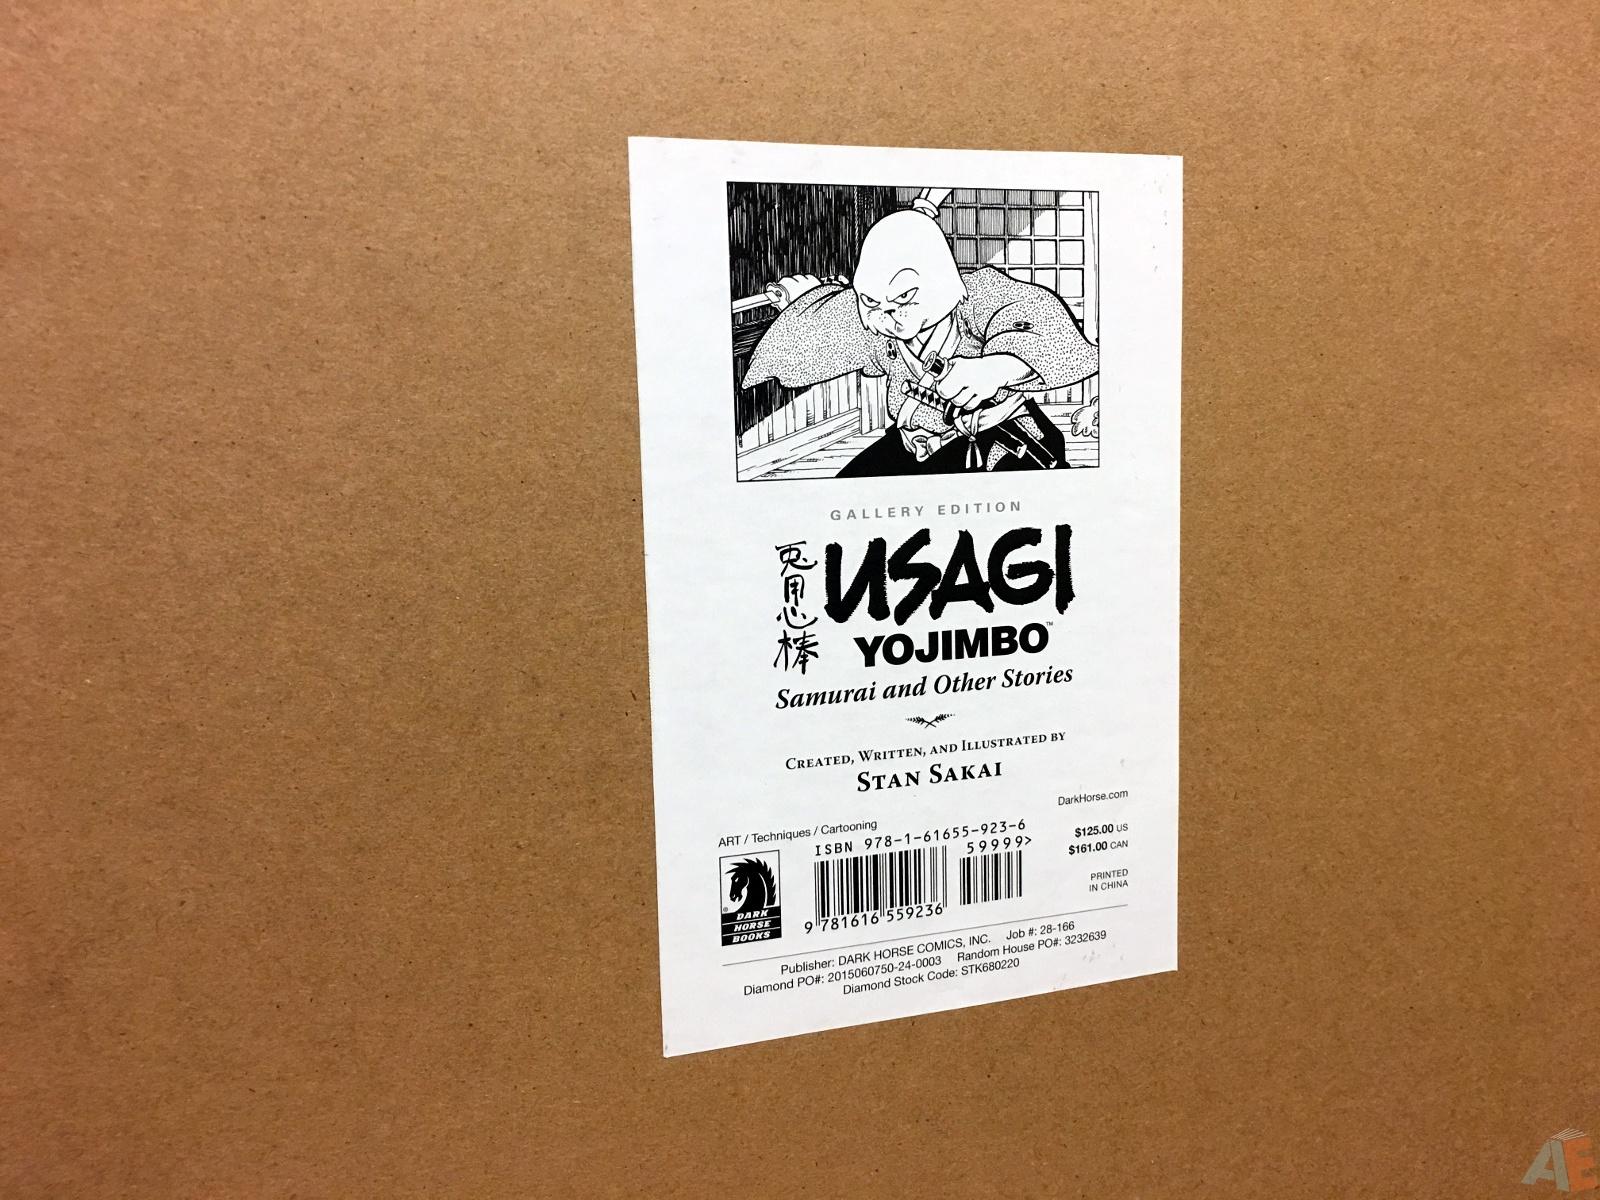 Usagi Yojimbo: Samurai and Other Stories Gallery Edition 52